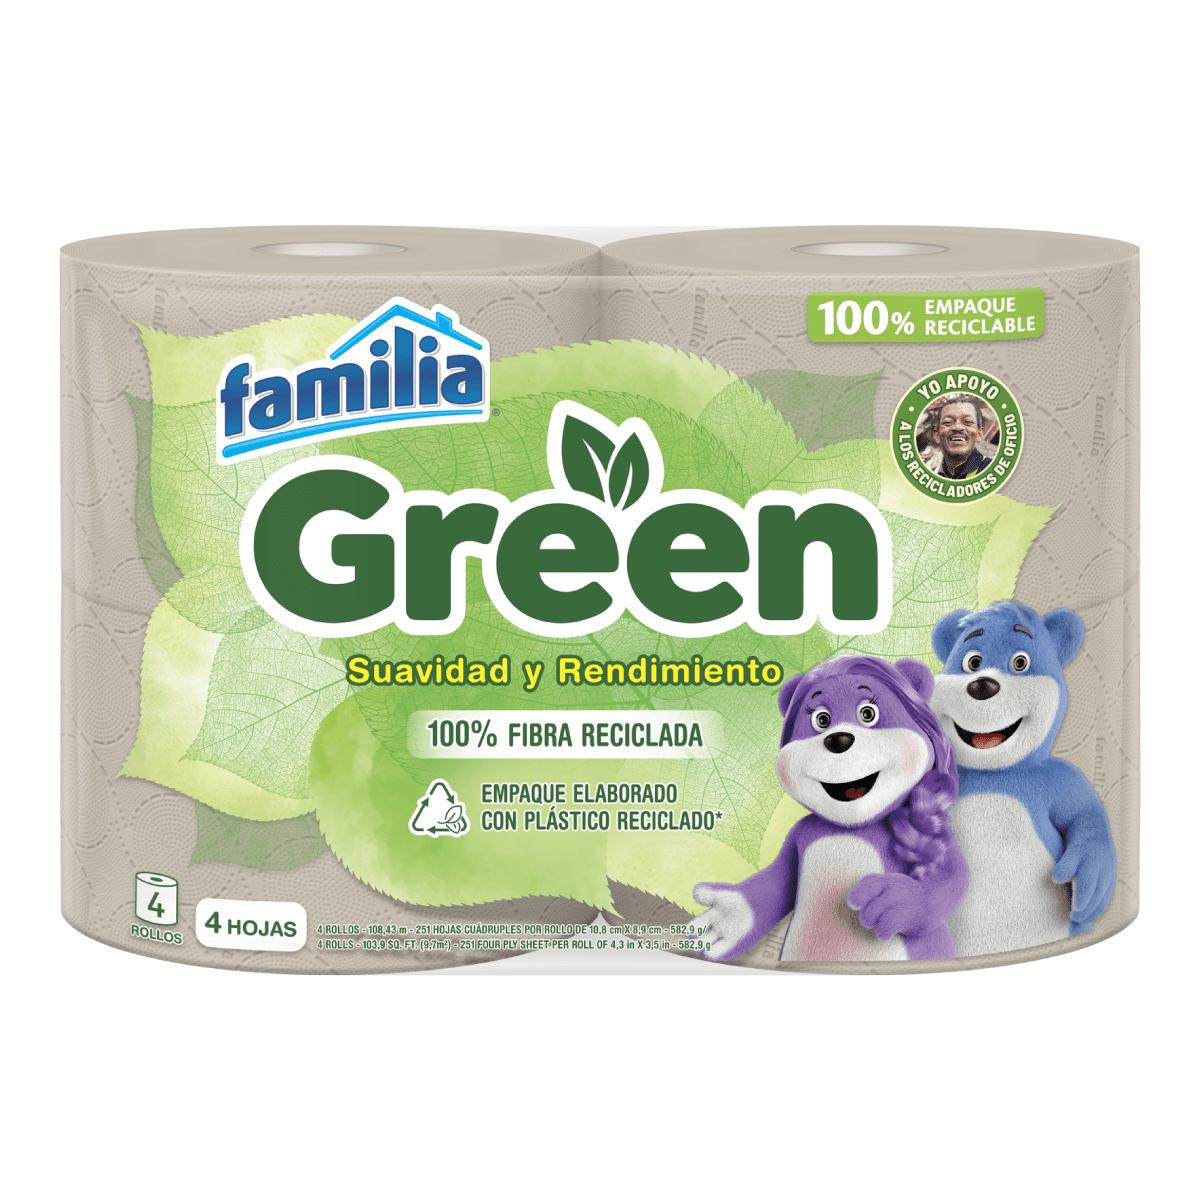 Imagen Papel Higiénico Familia Green X 4 Rollos